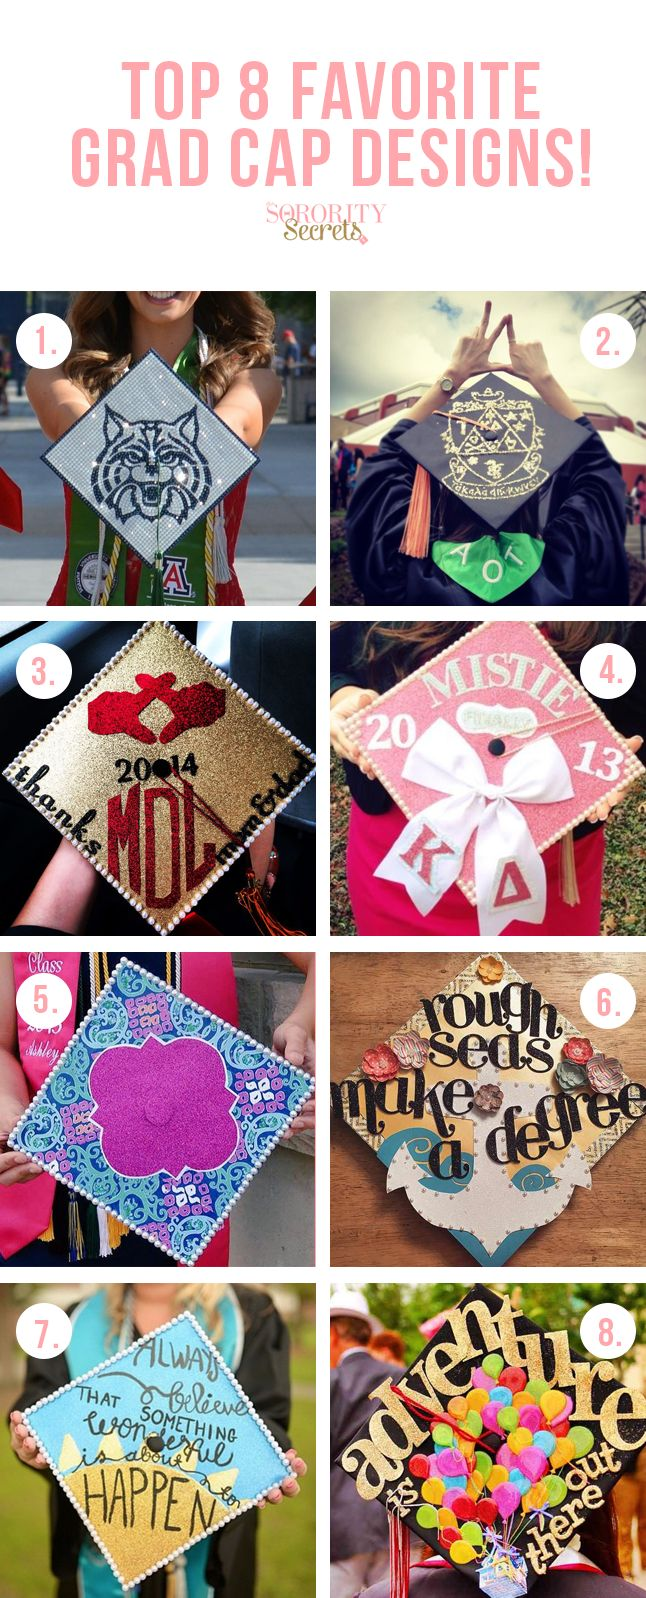 Our Top 8 Favorite Grad Cap Designs